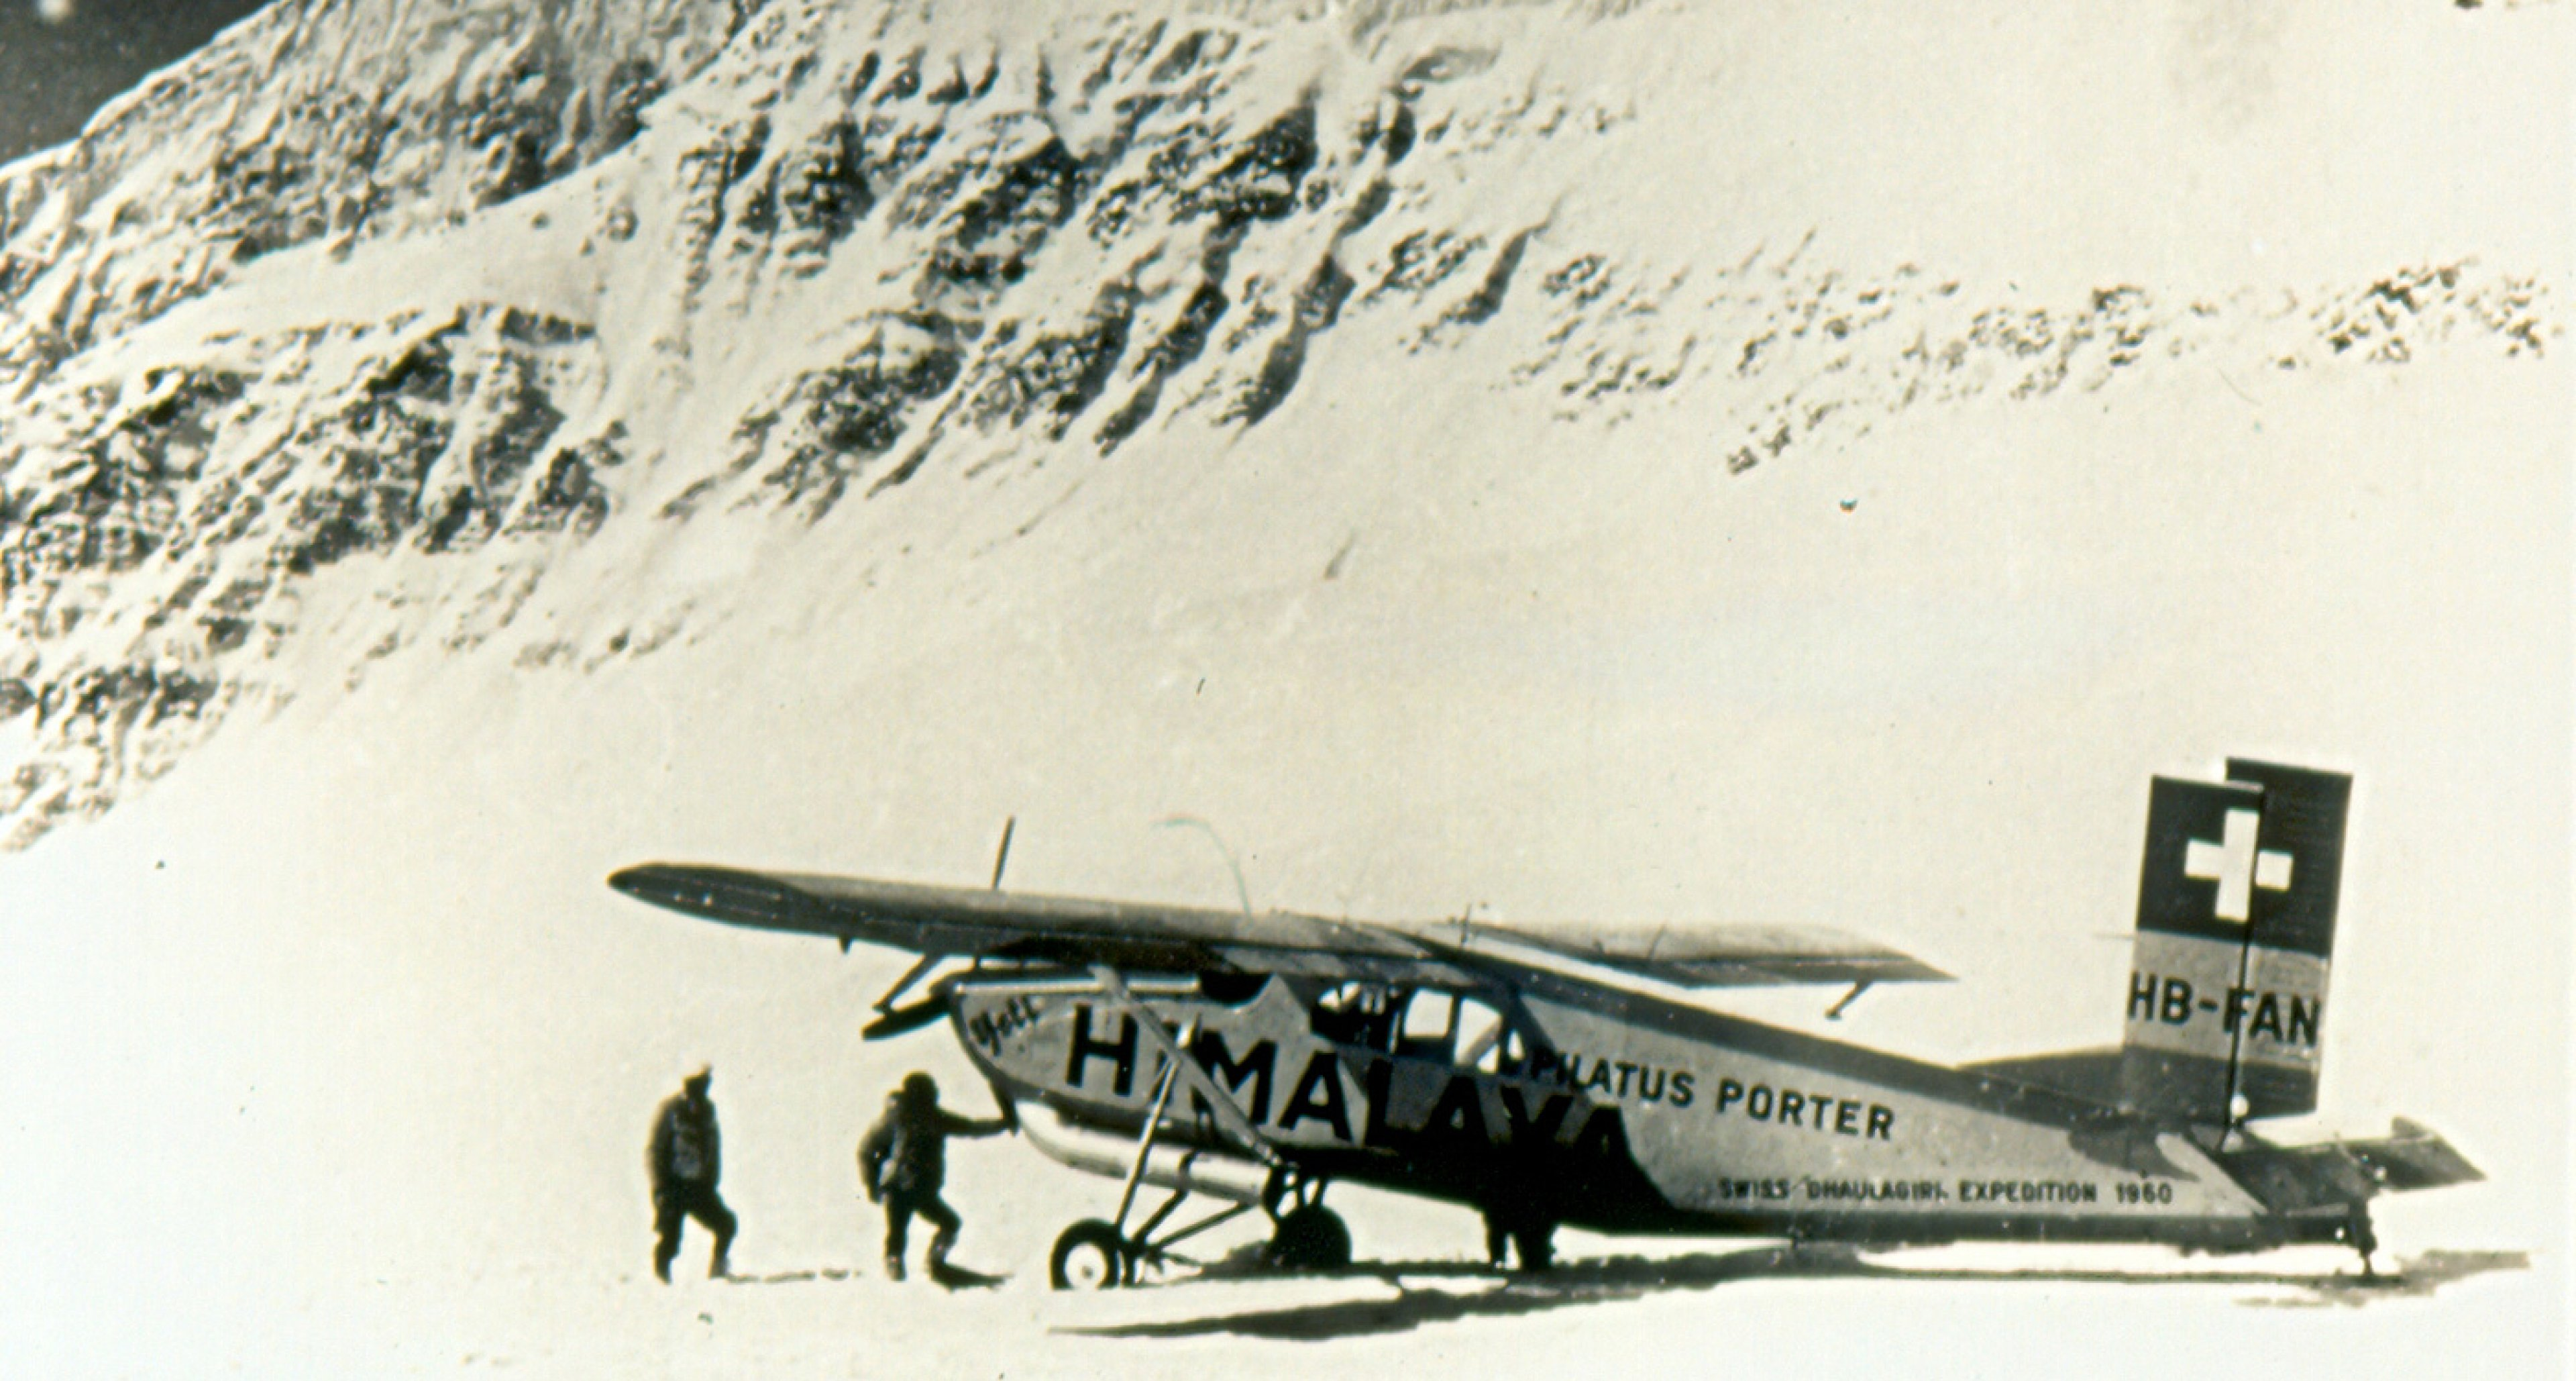 PC-6 Pilatus Porter Nepal Dhaulaghiri Expedition HB-FAN